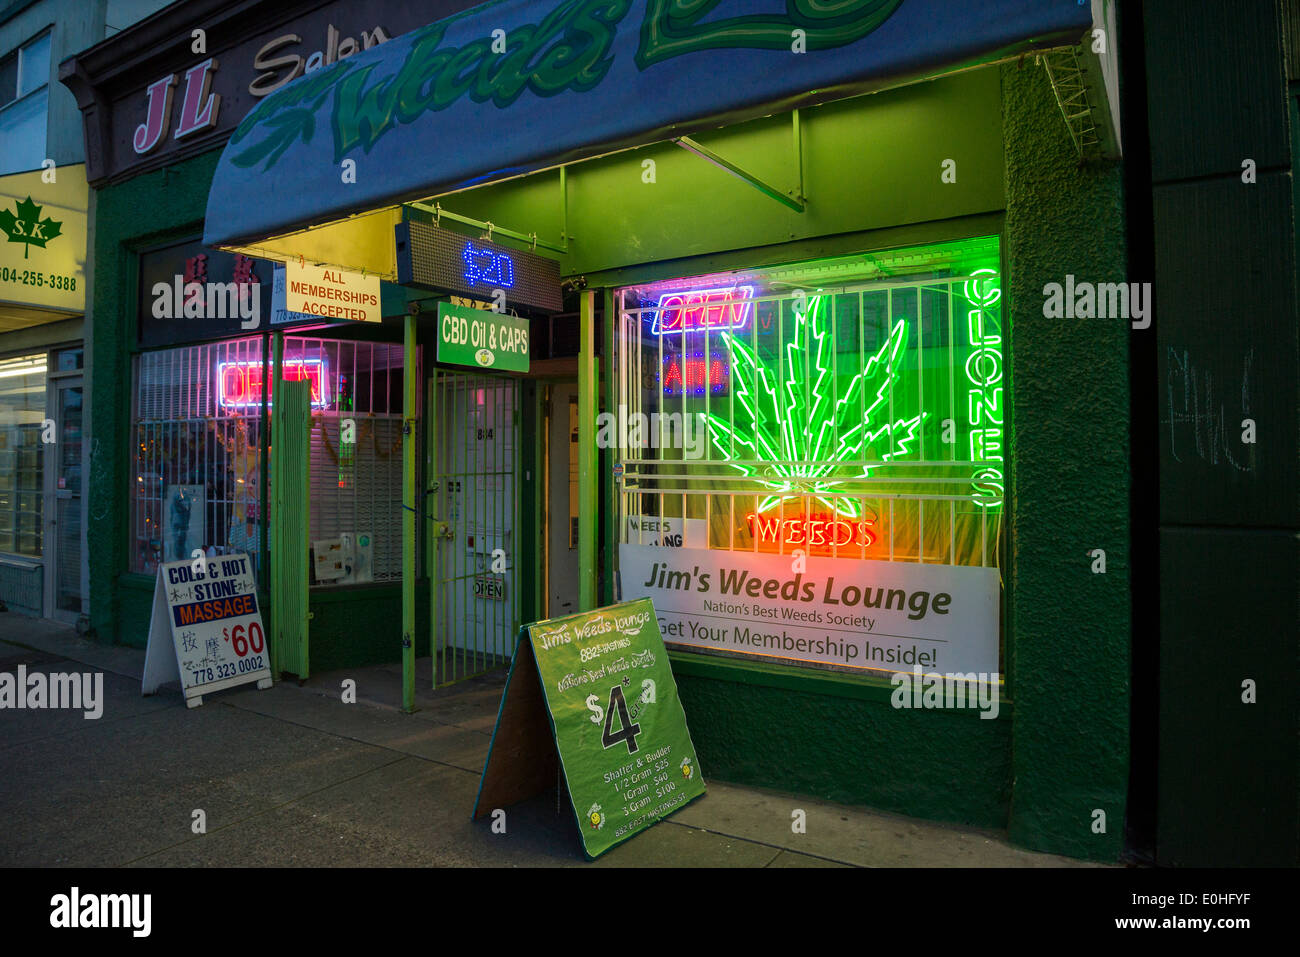 Jim's Weeds Lounge, medical marijuana dispensary, DTES, East Hastings St, Vancouver, British Columbia, Canada - Stock Image